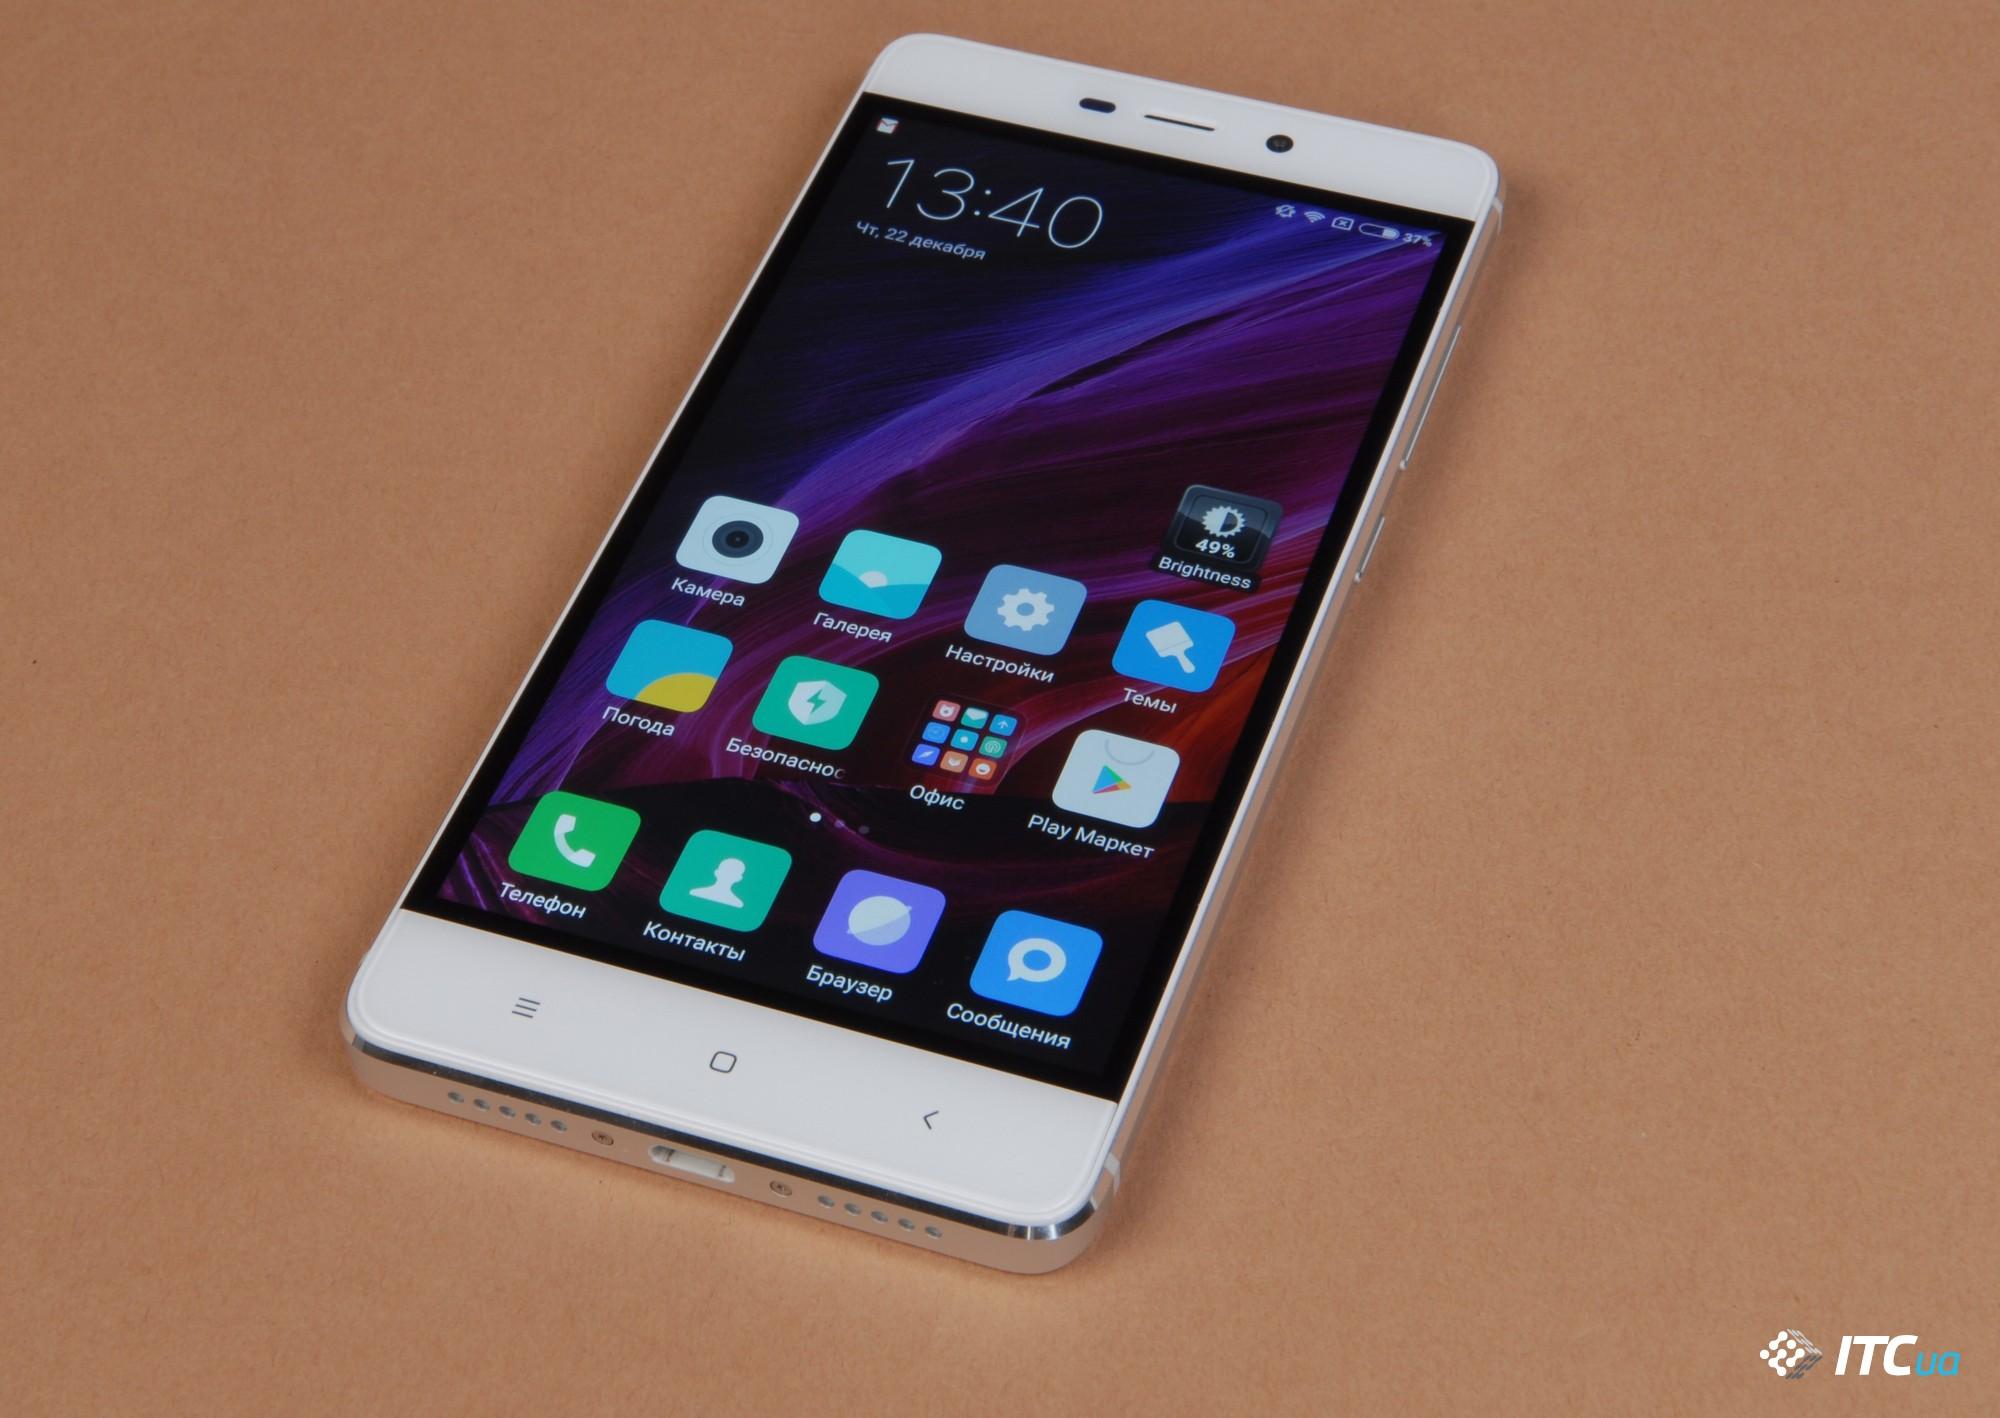 Описание смартфона Xiaomi Redmi 4